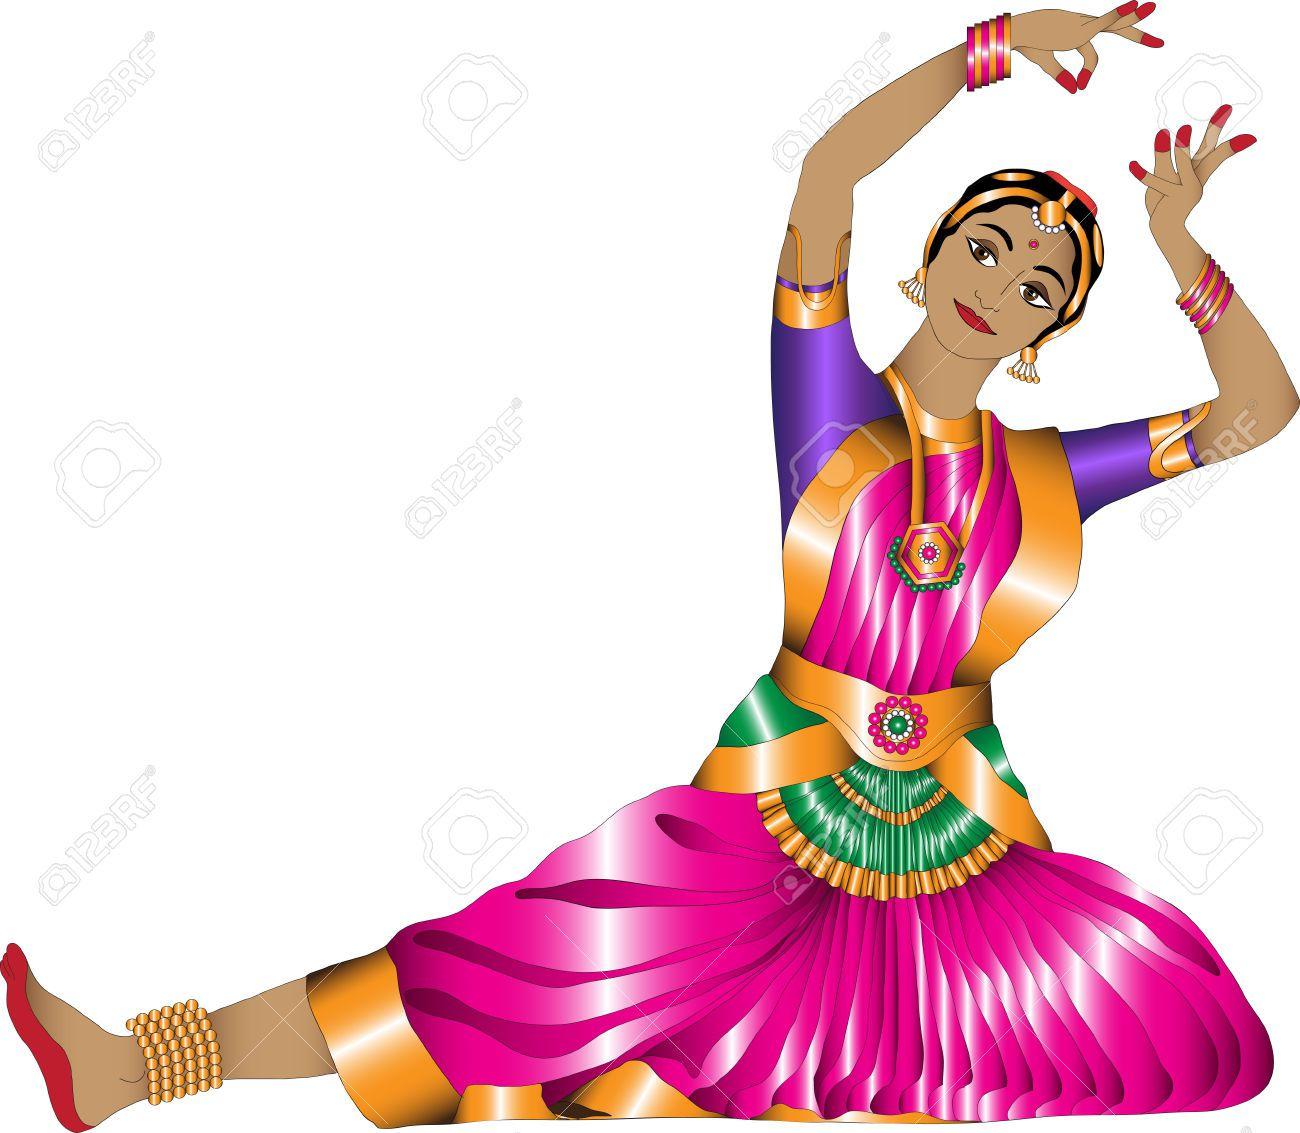 Indian clipart cultural dance Of Study Origin temples dances